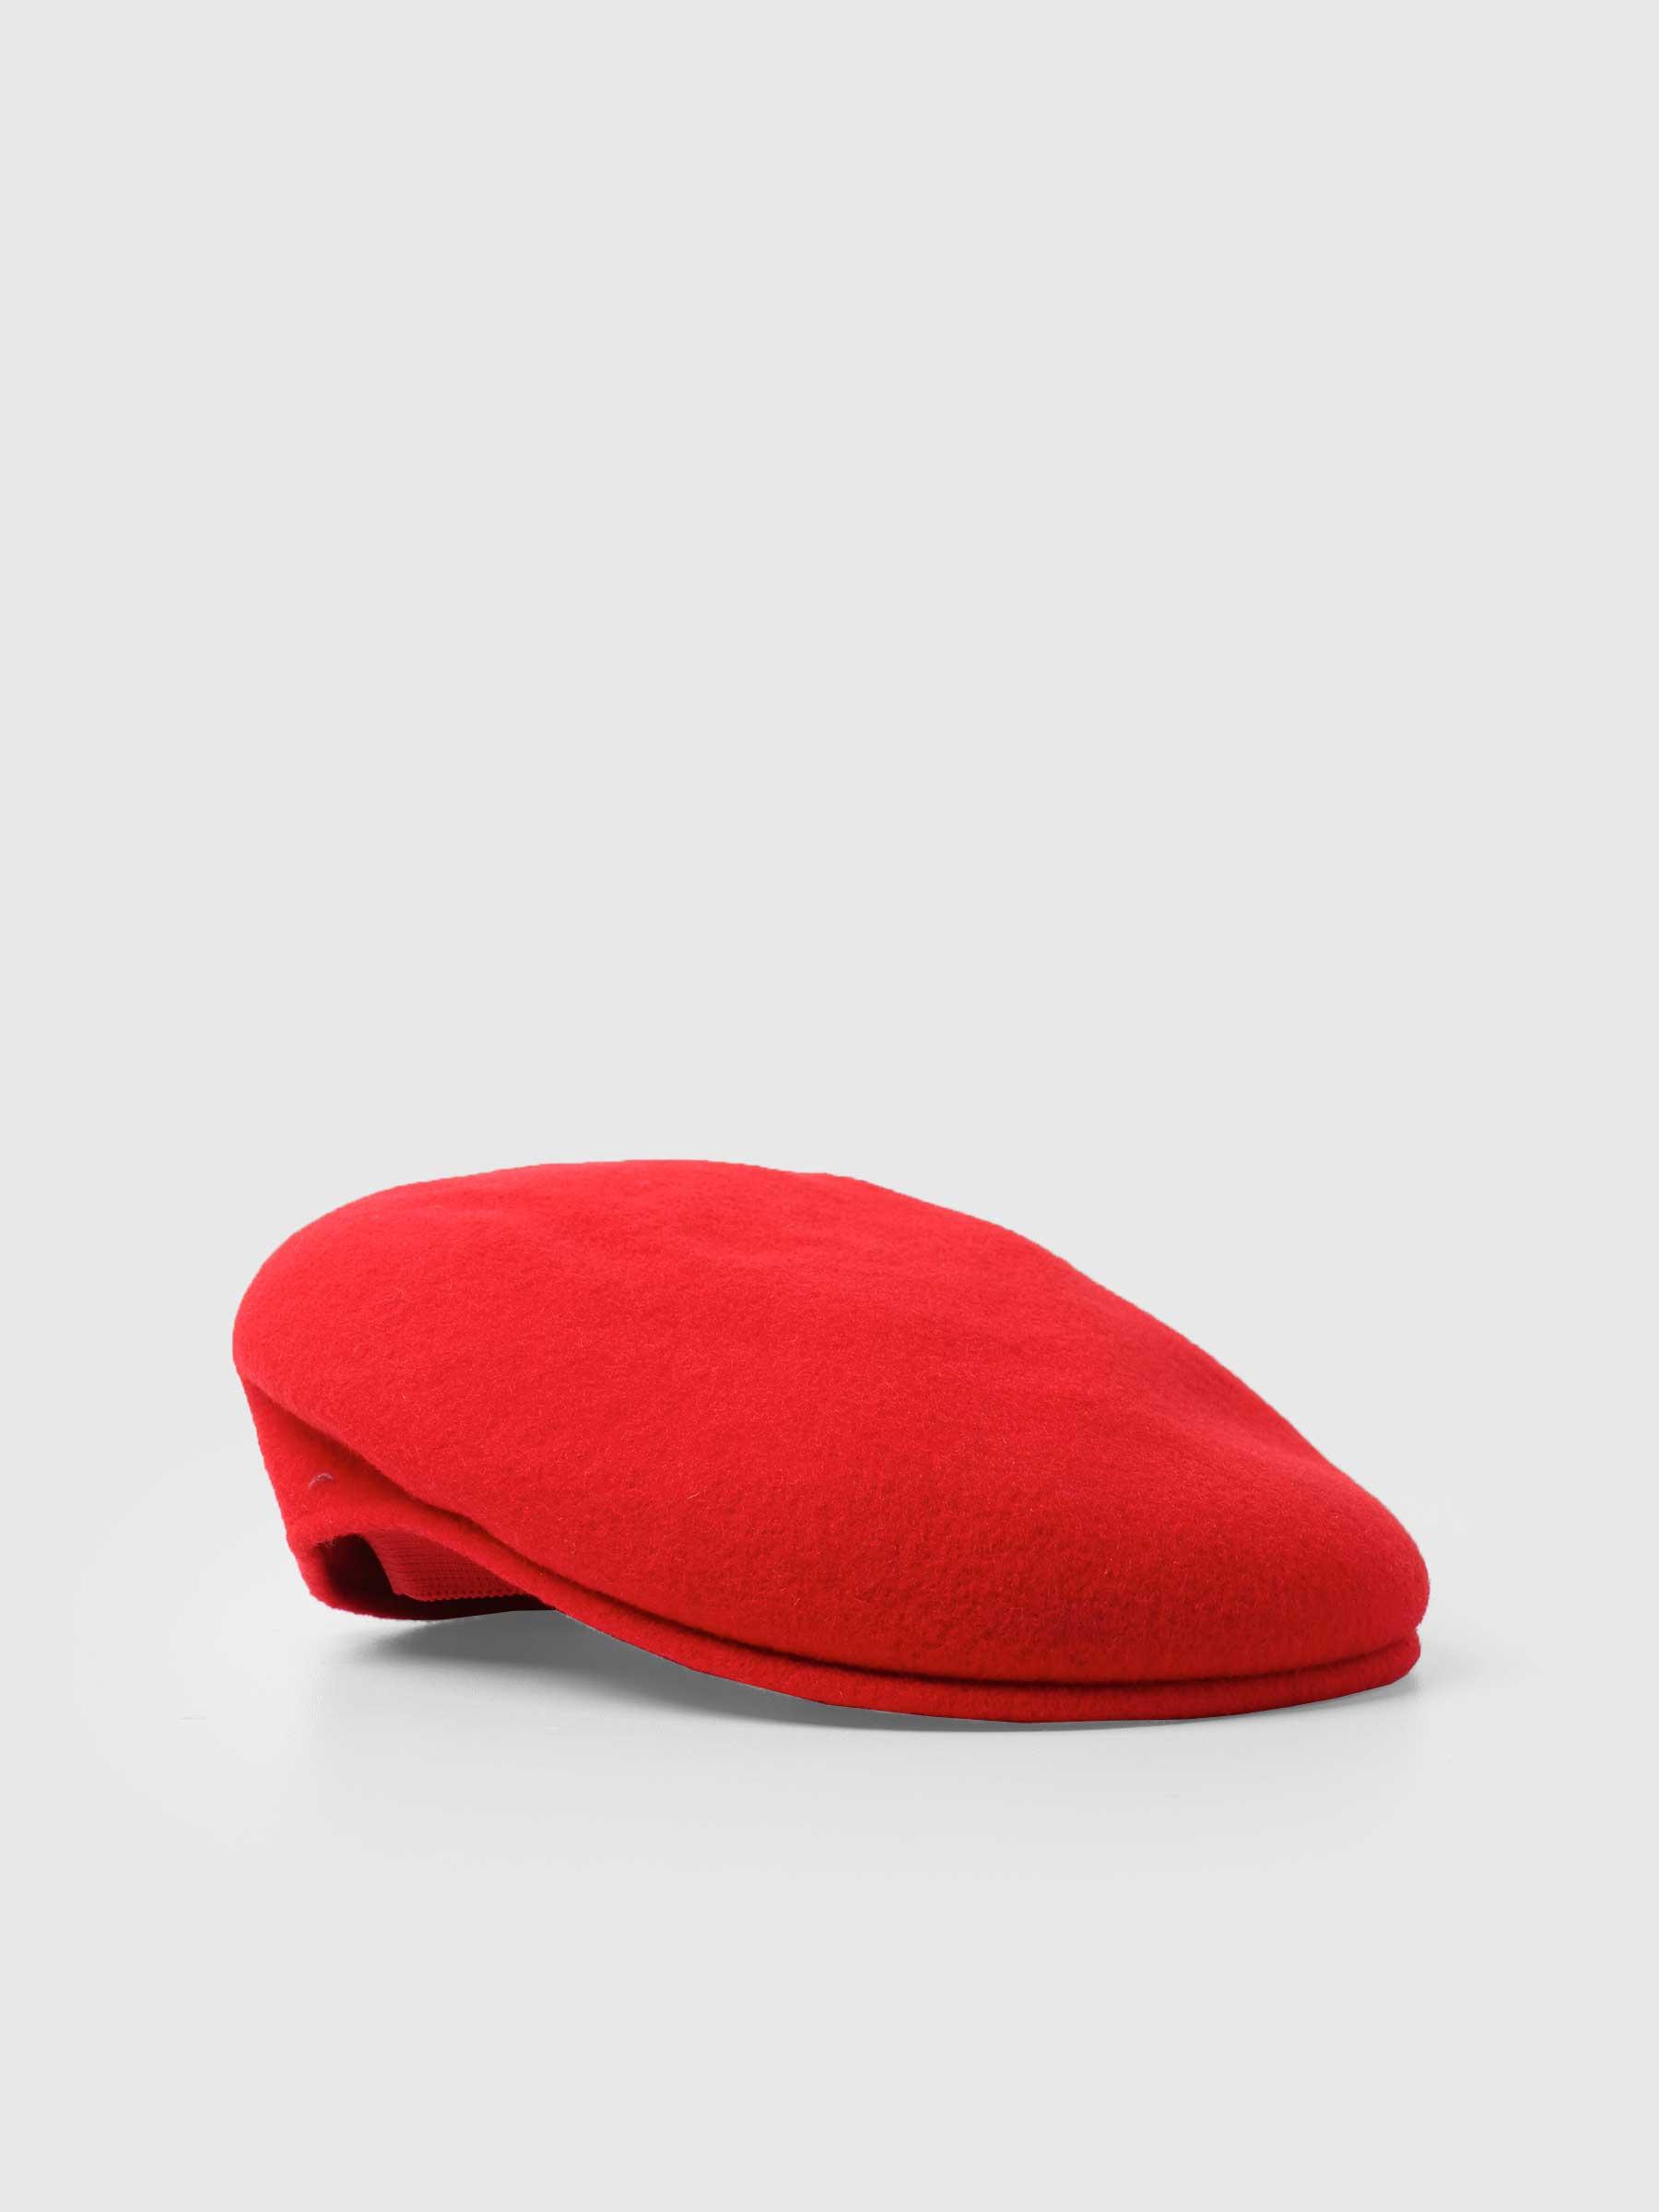 504 Kangol Cap Red 0258BC-RD608